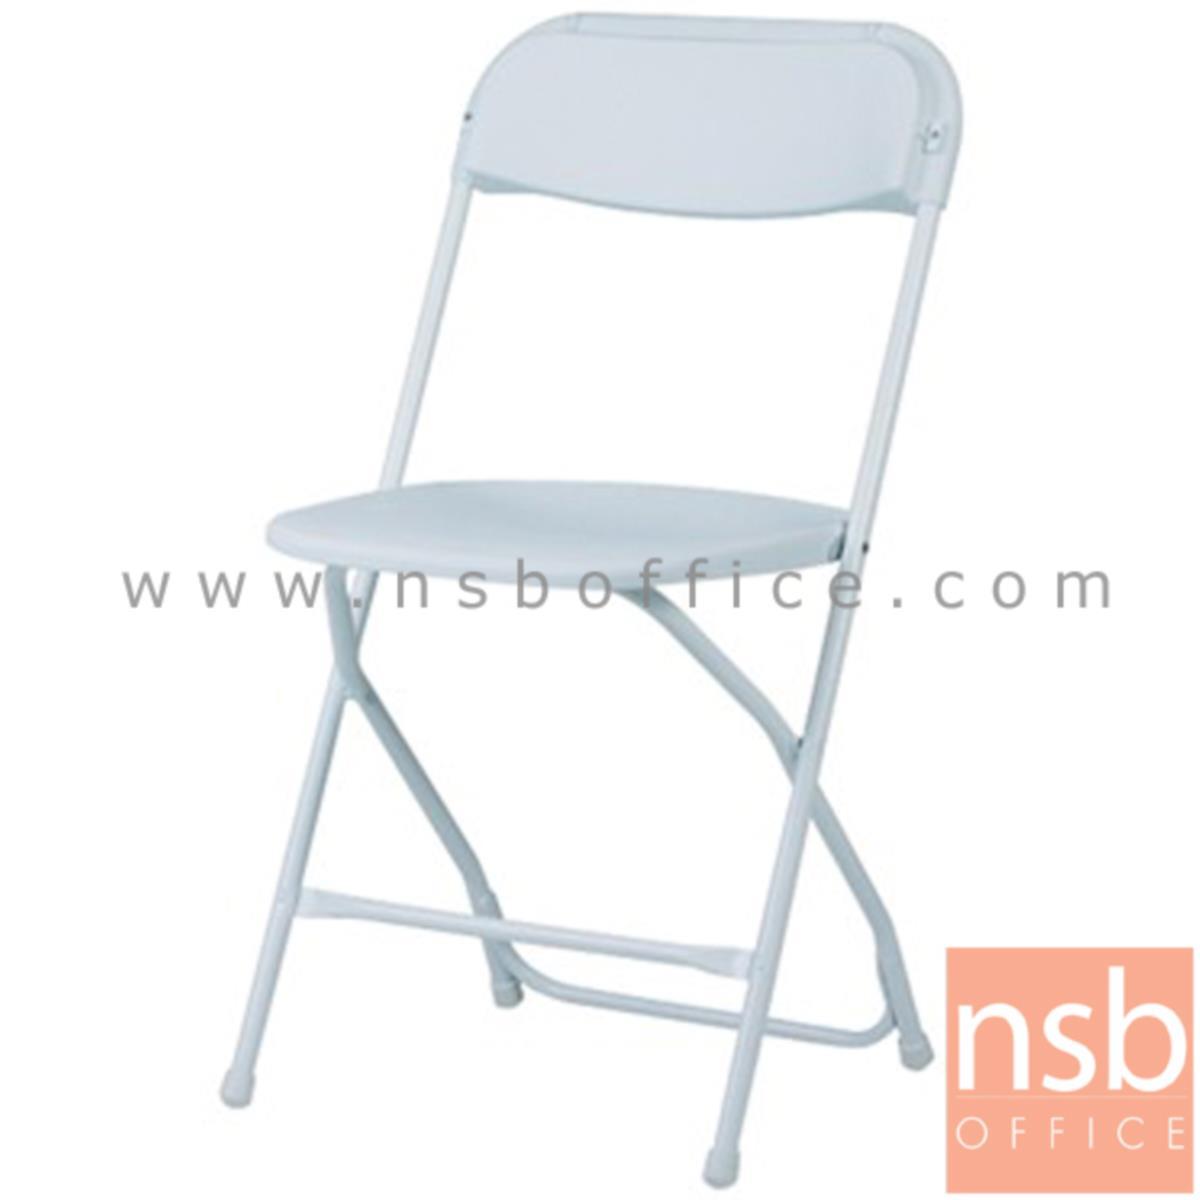 B10A084:เก้าอี้พับที่นั่งพลาสติก HDPE รุ่น GC-25NW ขาเหล็กพ่นสีขาว